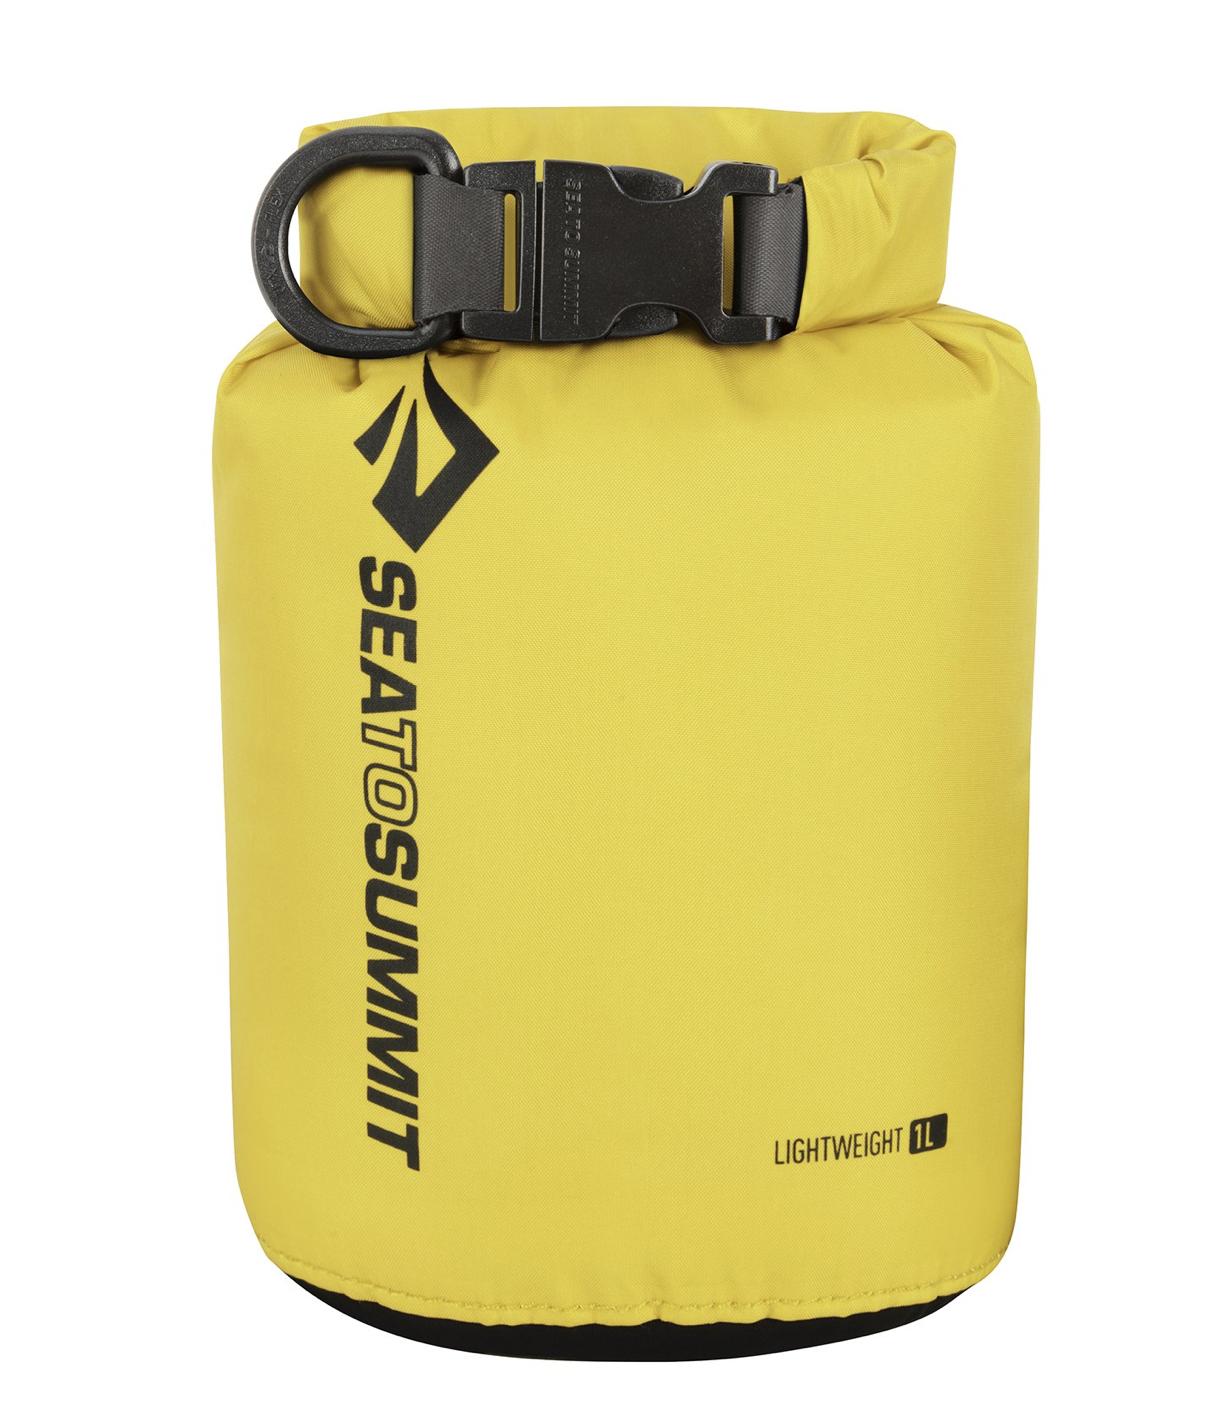 Bilde av Sea To Summit  Lightweight Dry Sack 1L Gul